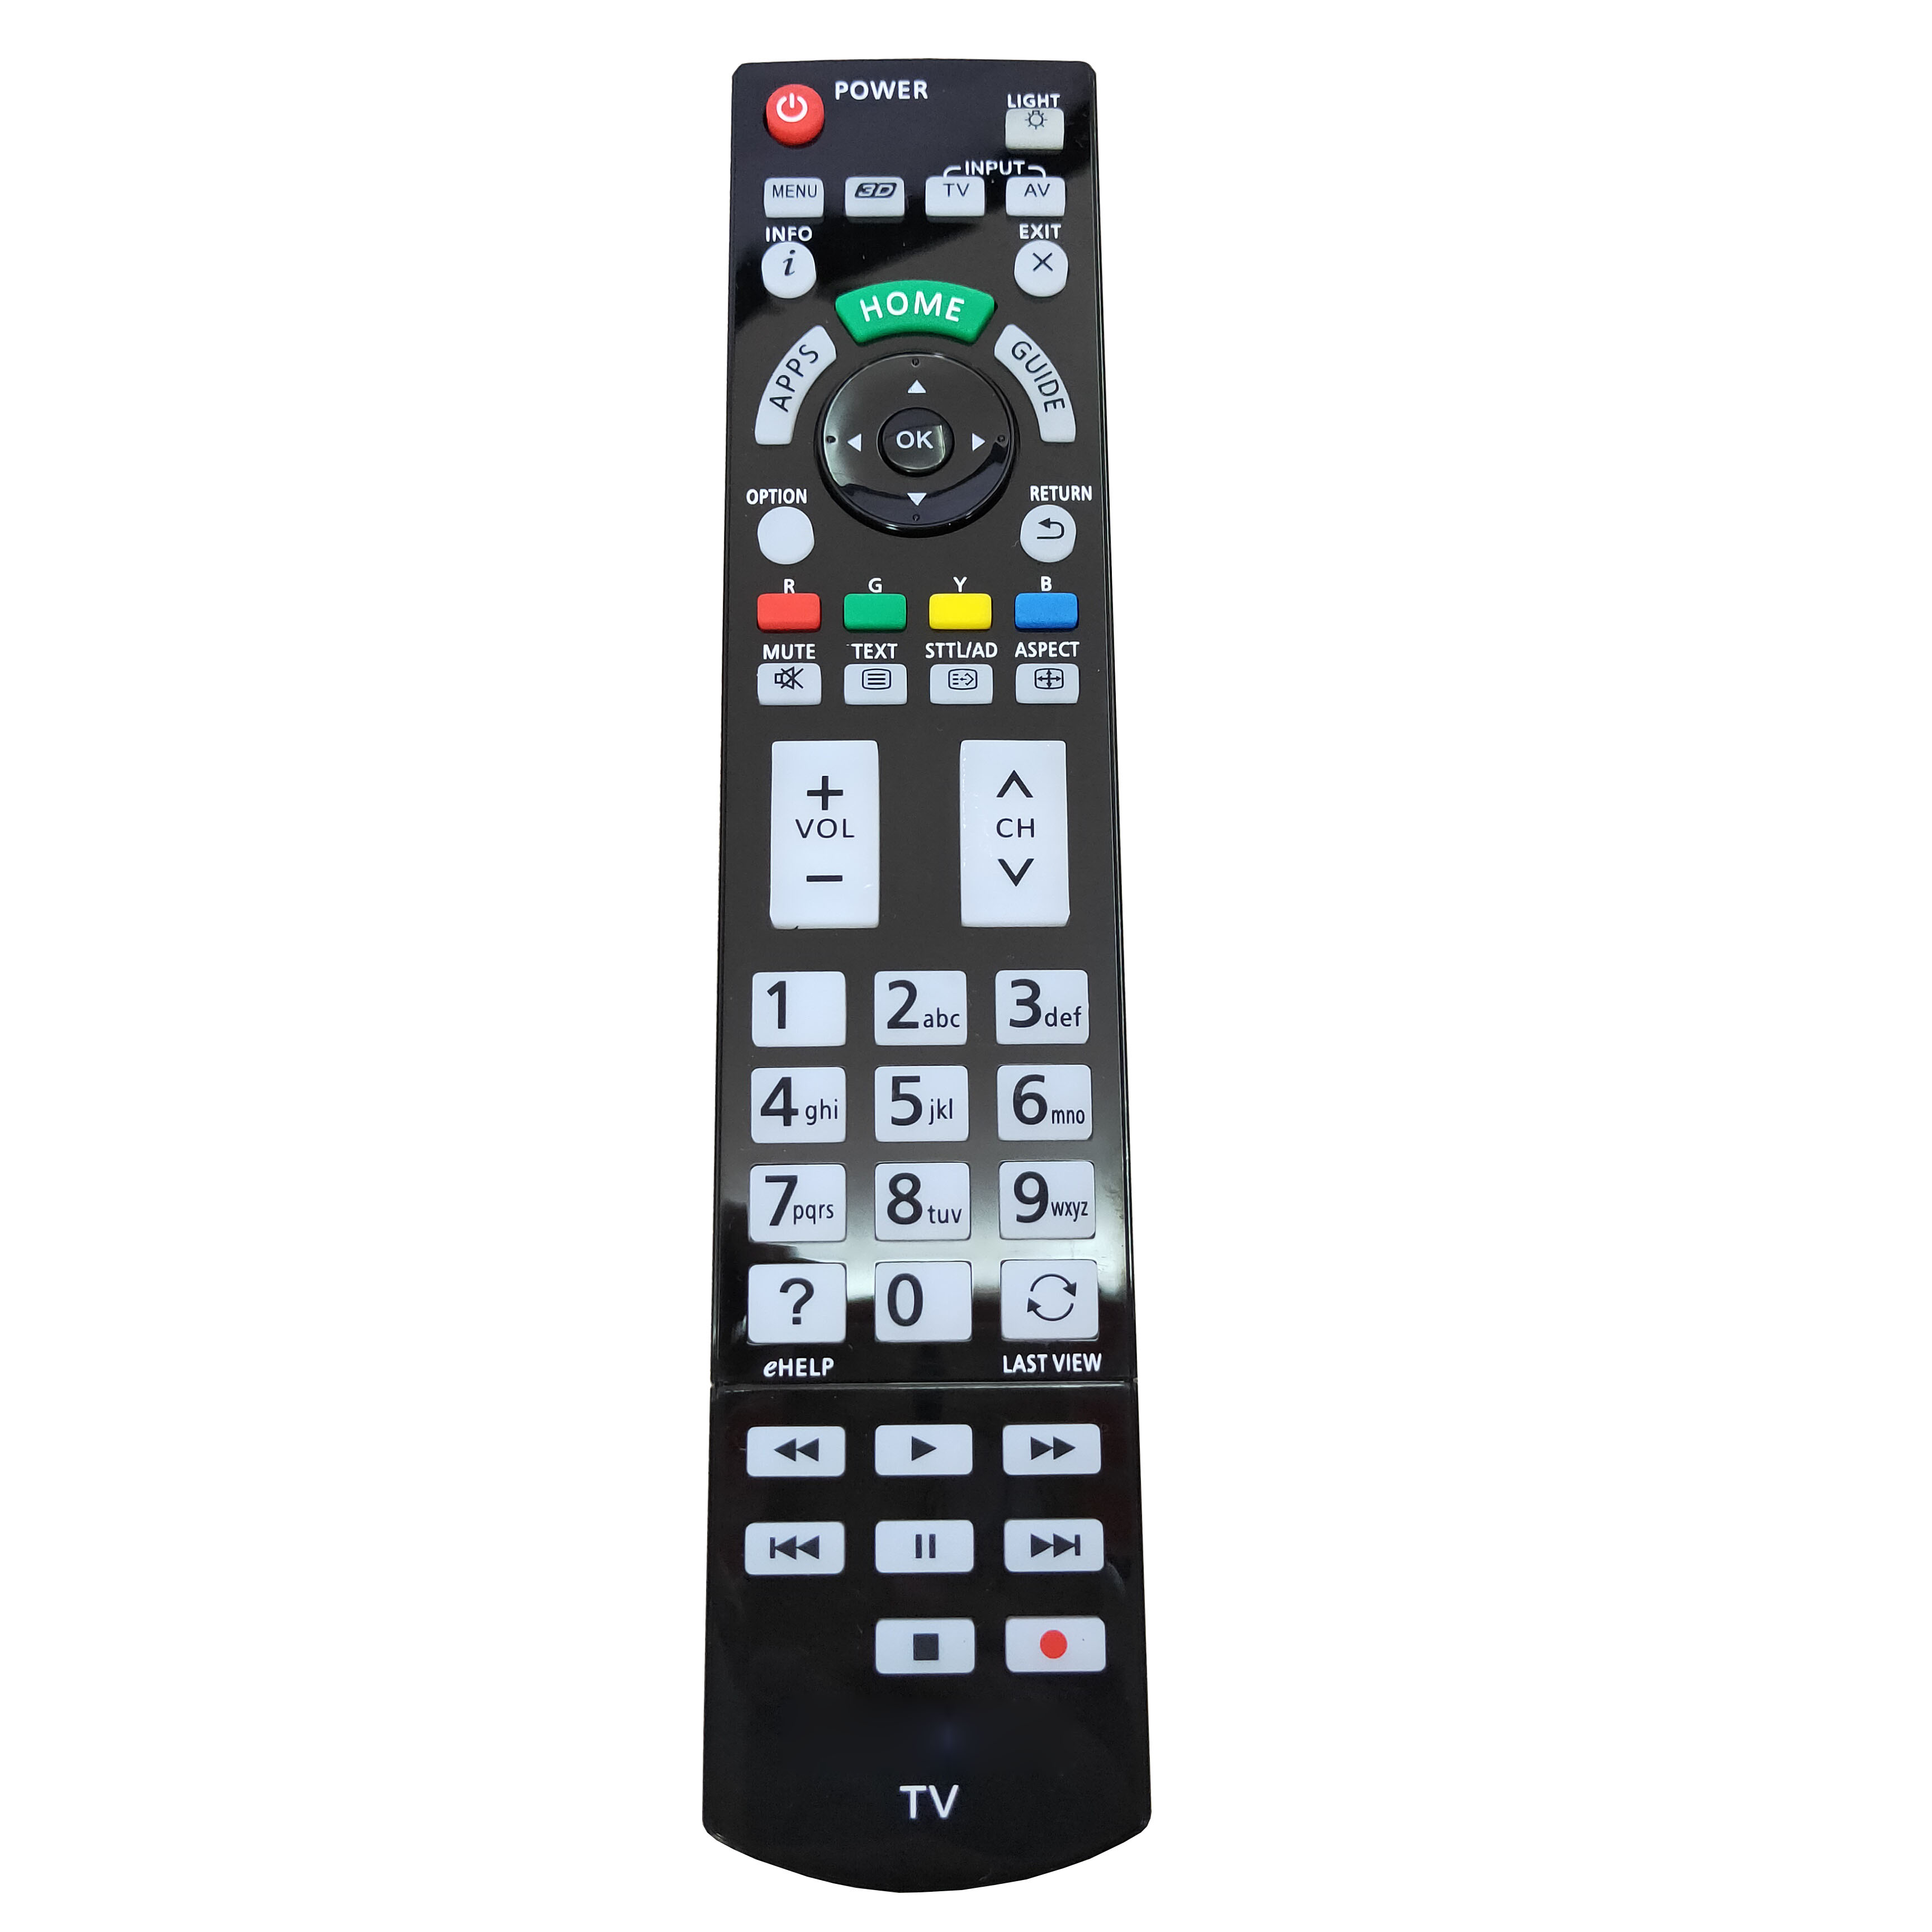 NEUE Original N2QAYB000936 für PANASONIC TV fernbedienung für TH58AX800A TH60AS800A TH65AX800A Fernbedienung